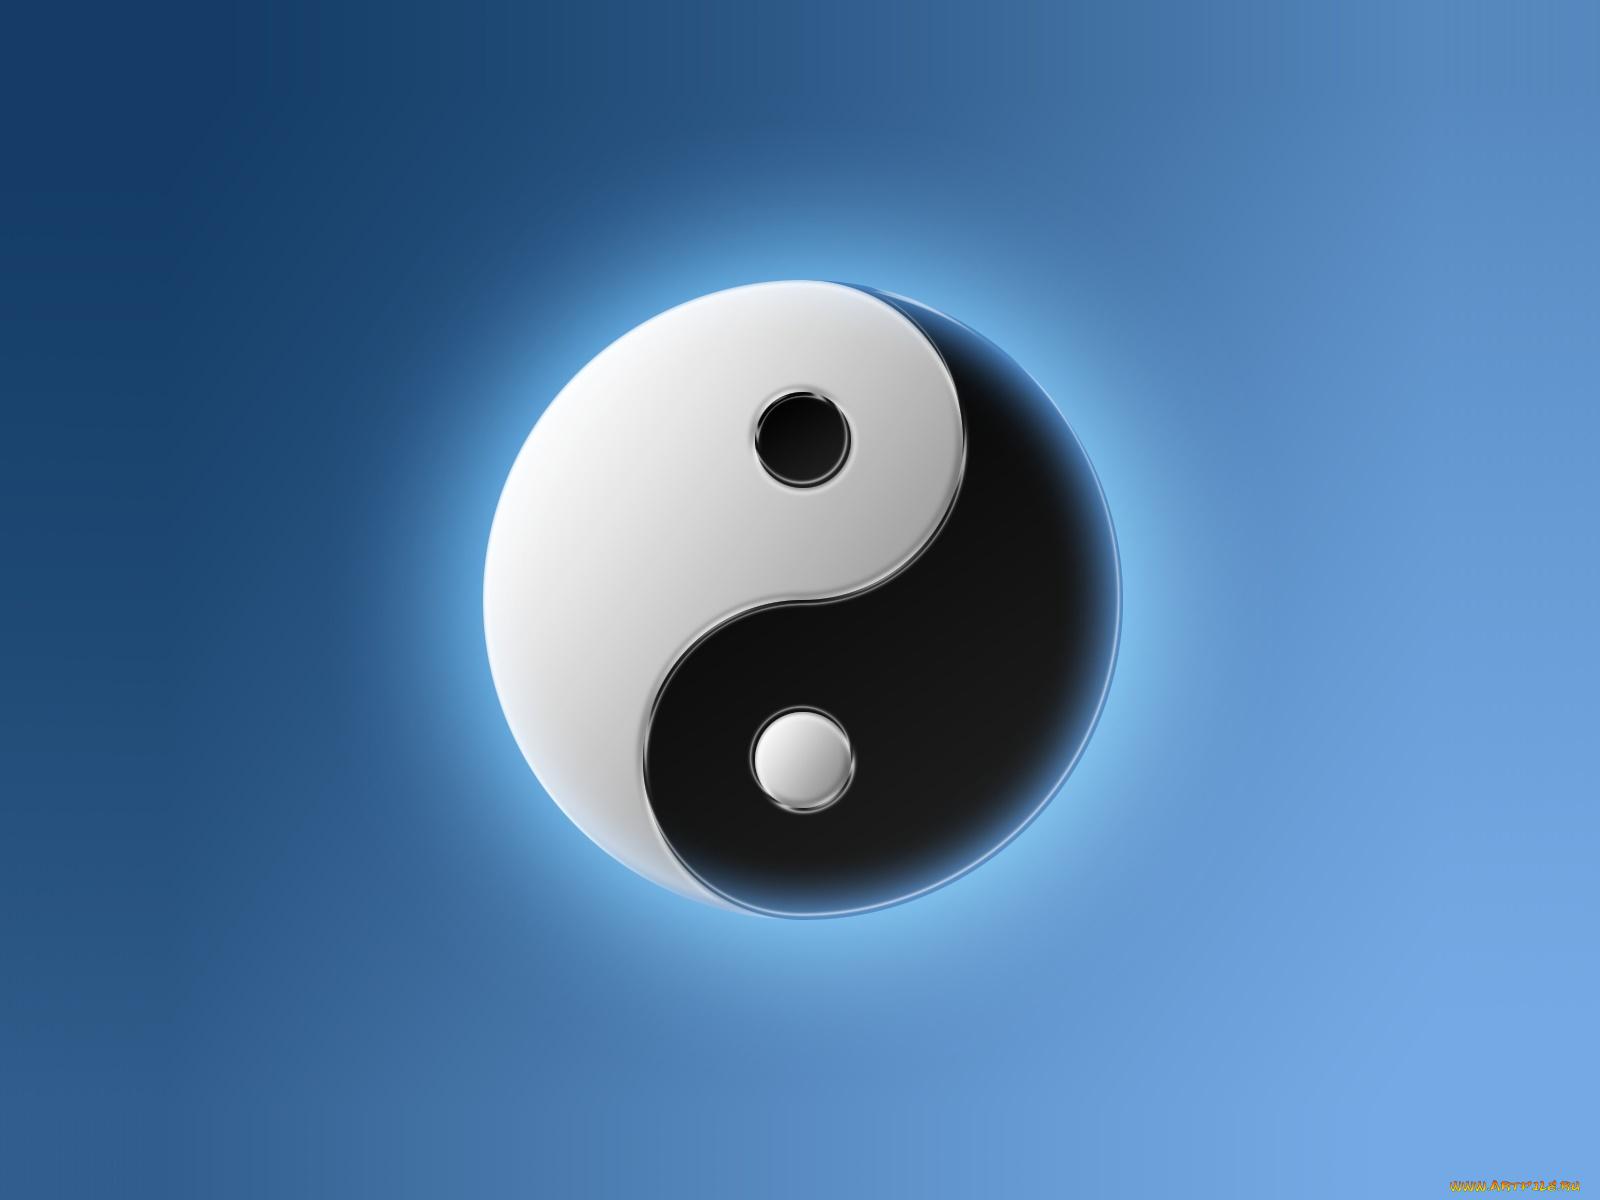 3d-grafika-in-yan--yin-yang-logotip-fon-